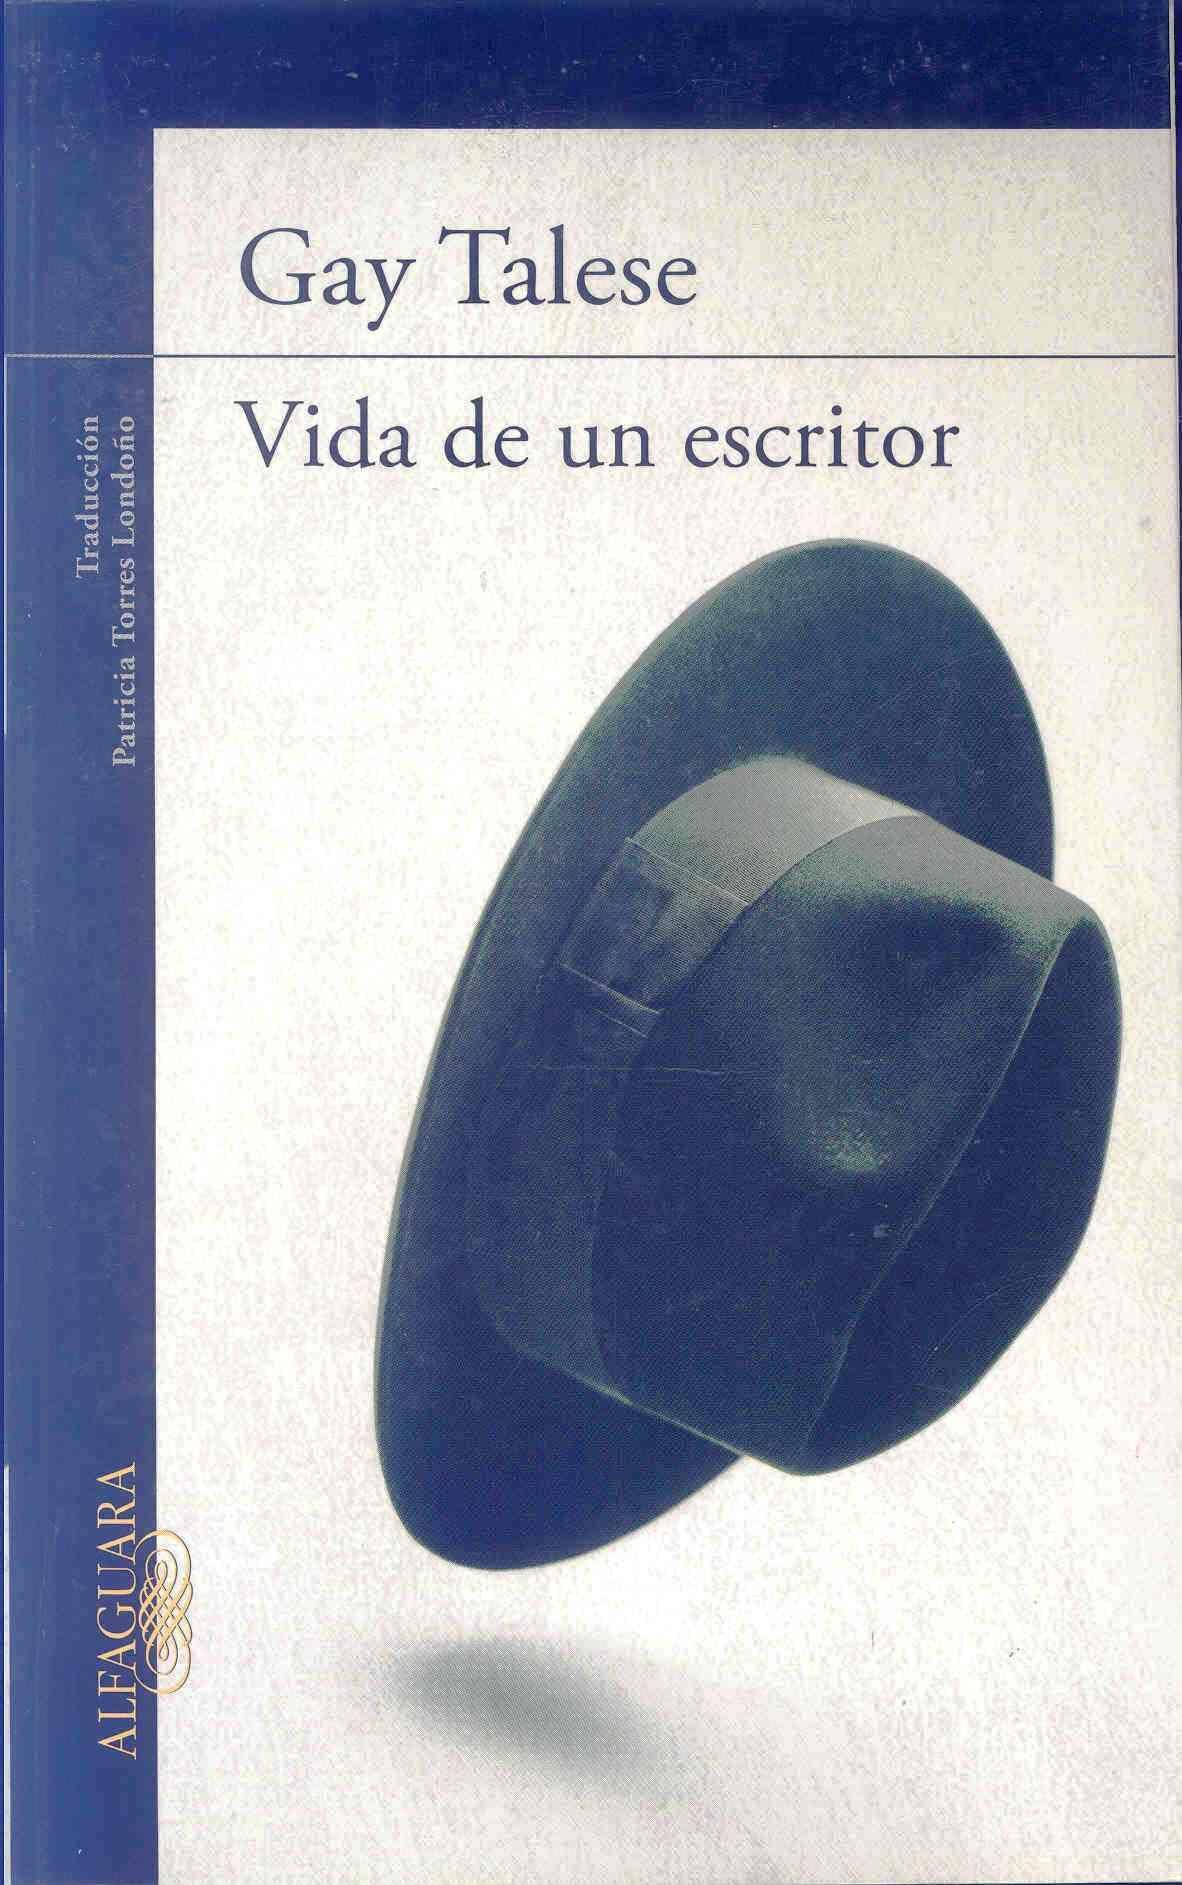 920.5 T17 / Piso 3 Historia - HS40 | Literatura | Pinterest ...